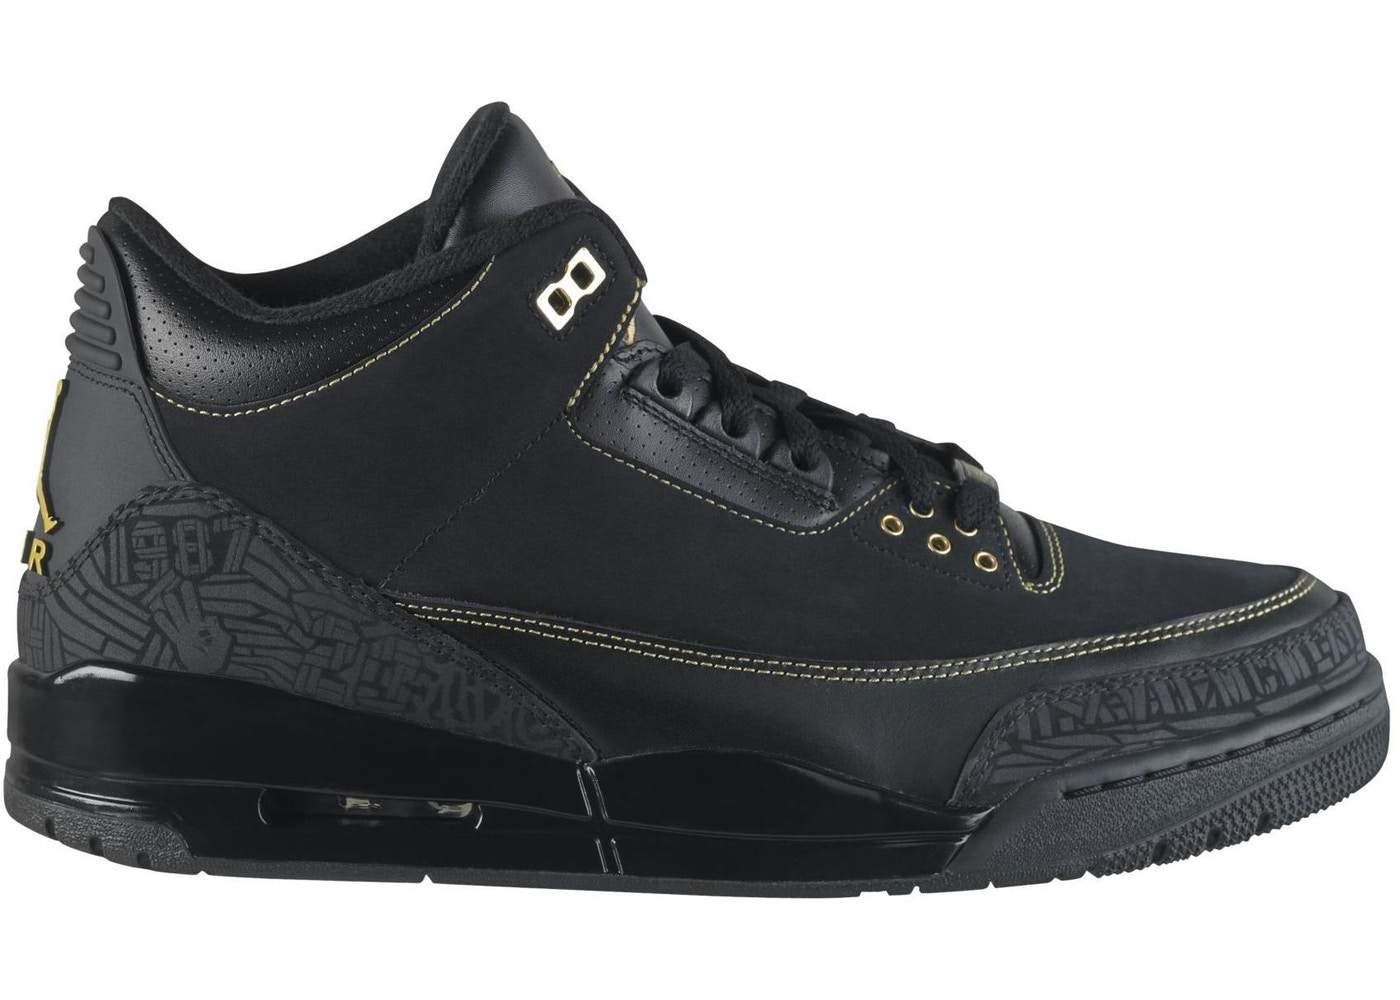 Air Jordan 3 Shoes - Average Sale Price e2deb6fb1